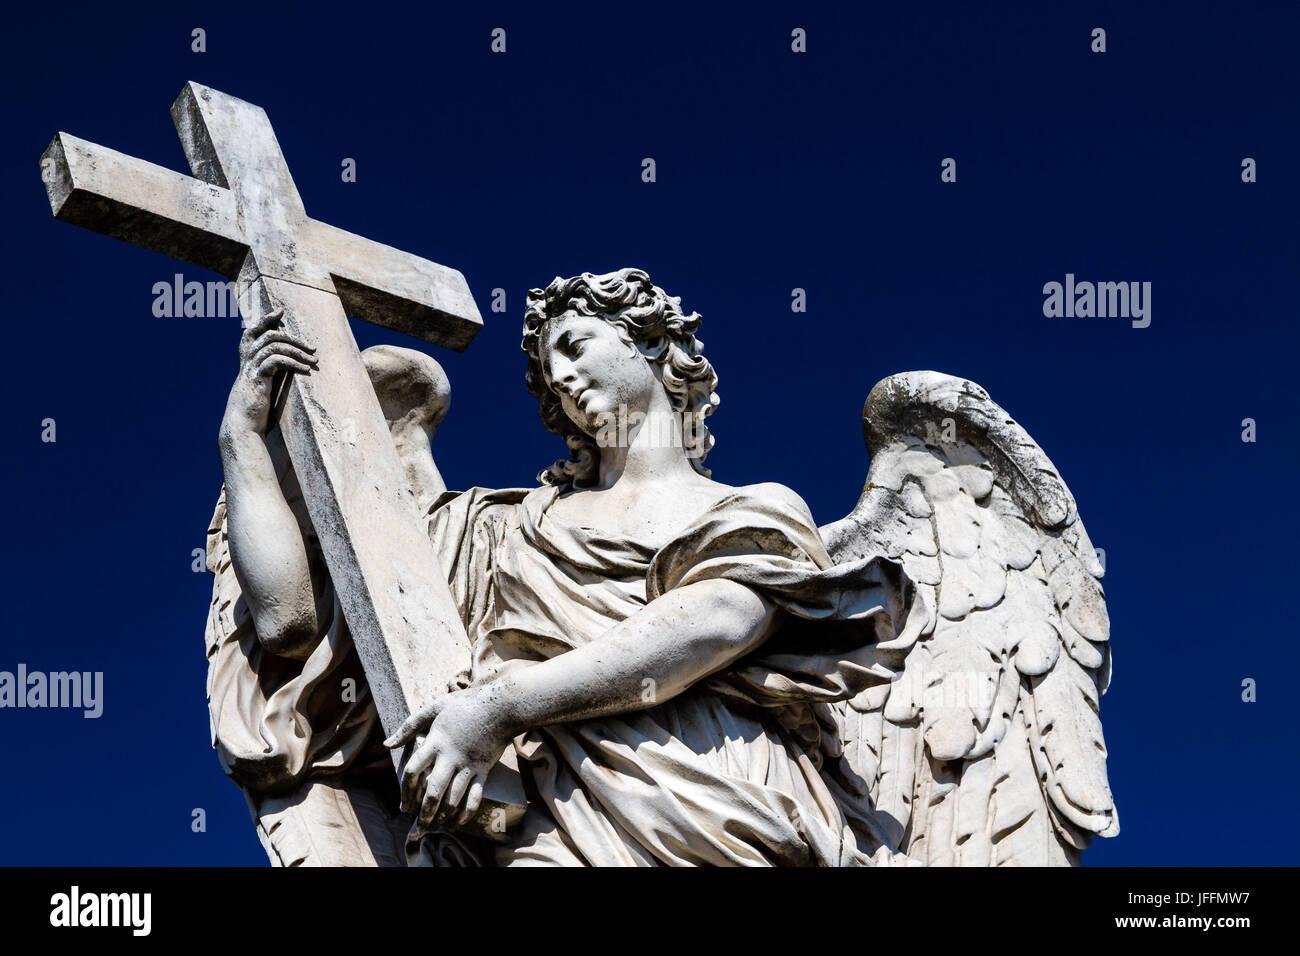 Statue Adorning the Bridge of Angels (Ponte Sant'Angelo), Rome, Italy - Stock Image